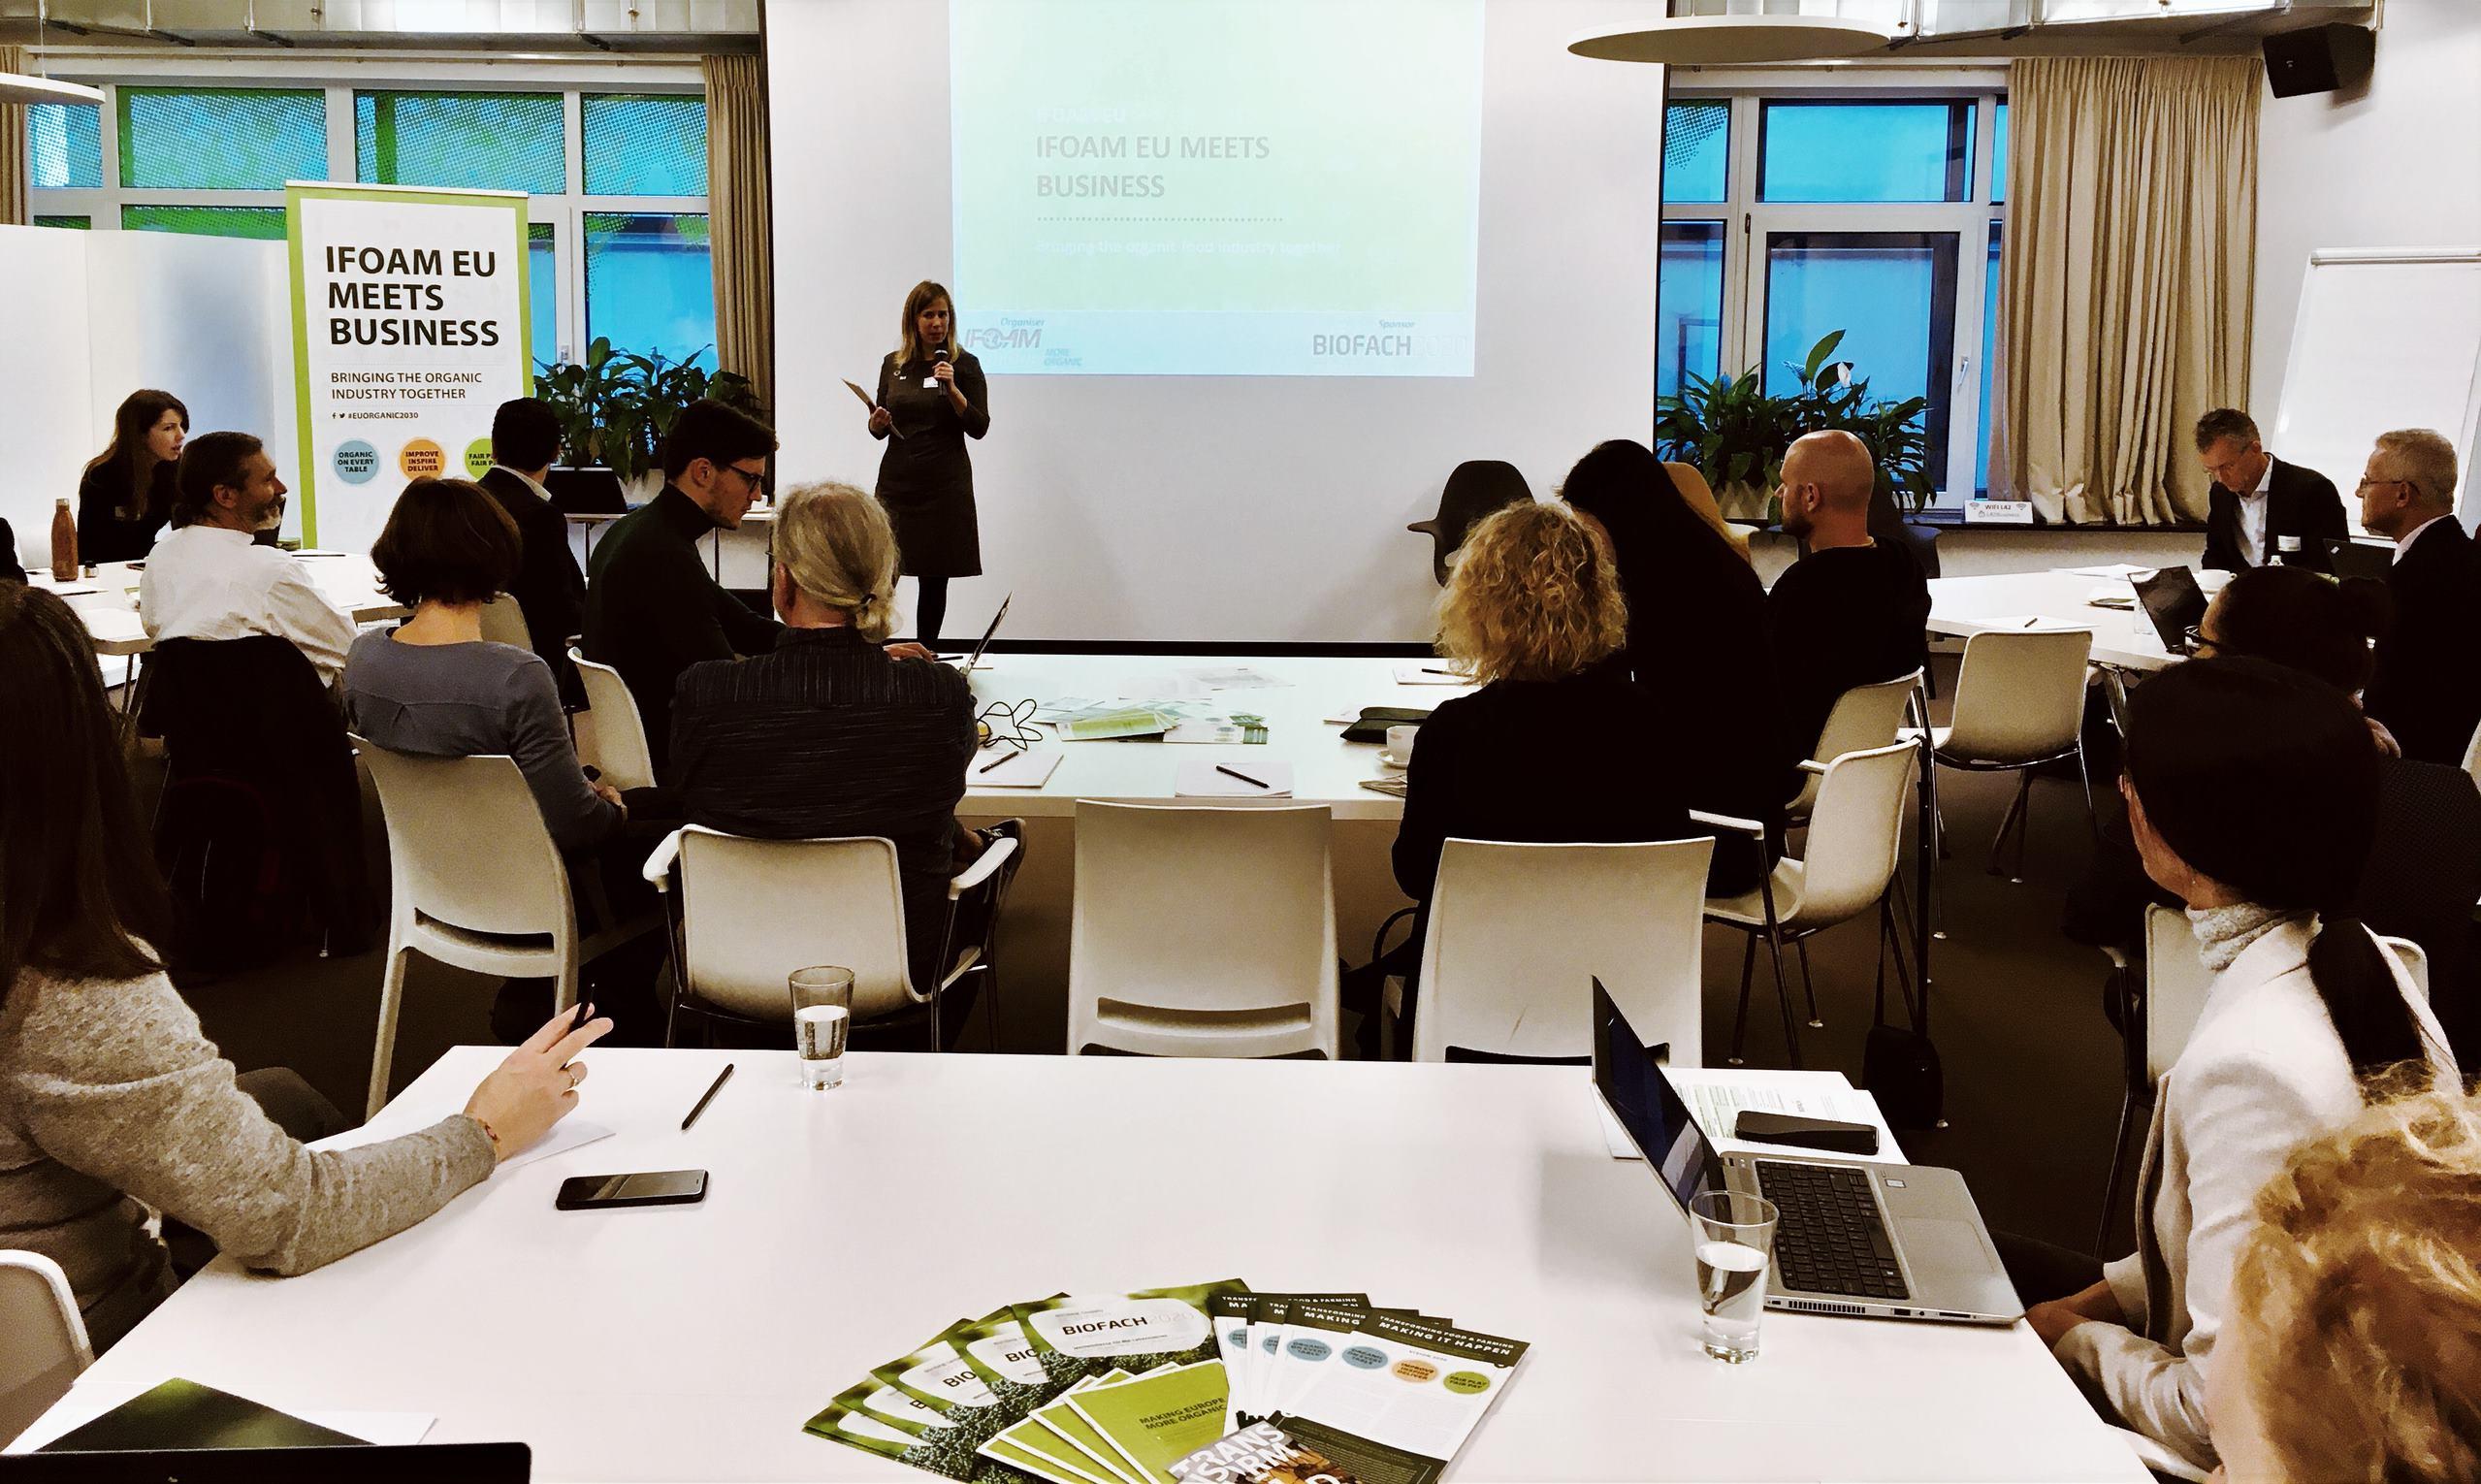 IFOAM EU Meets Business